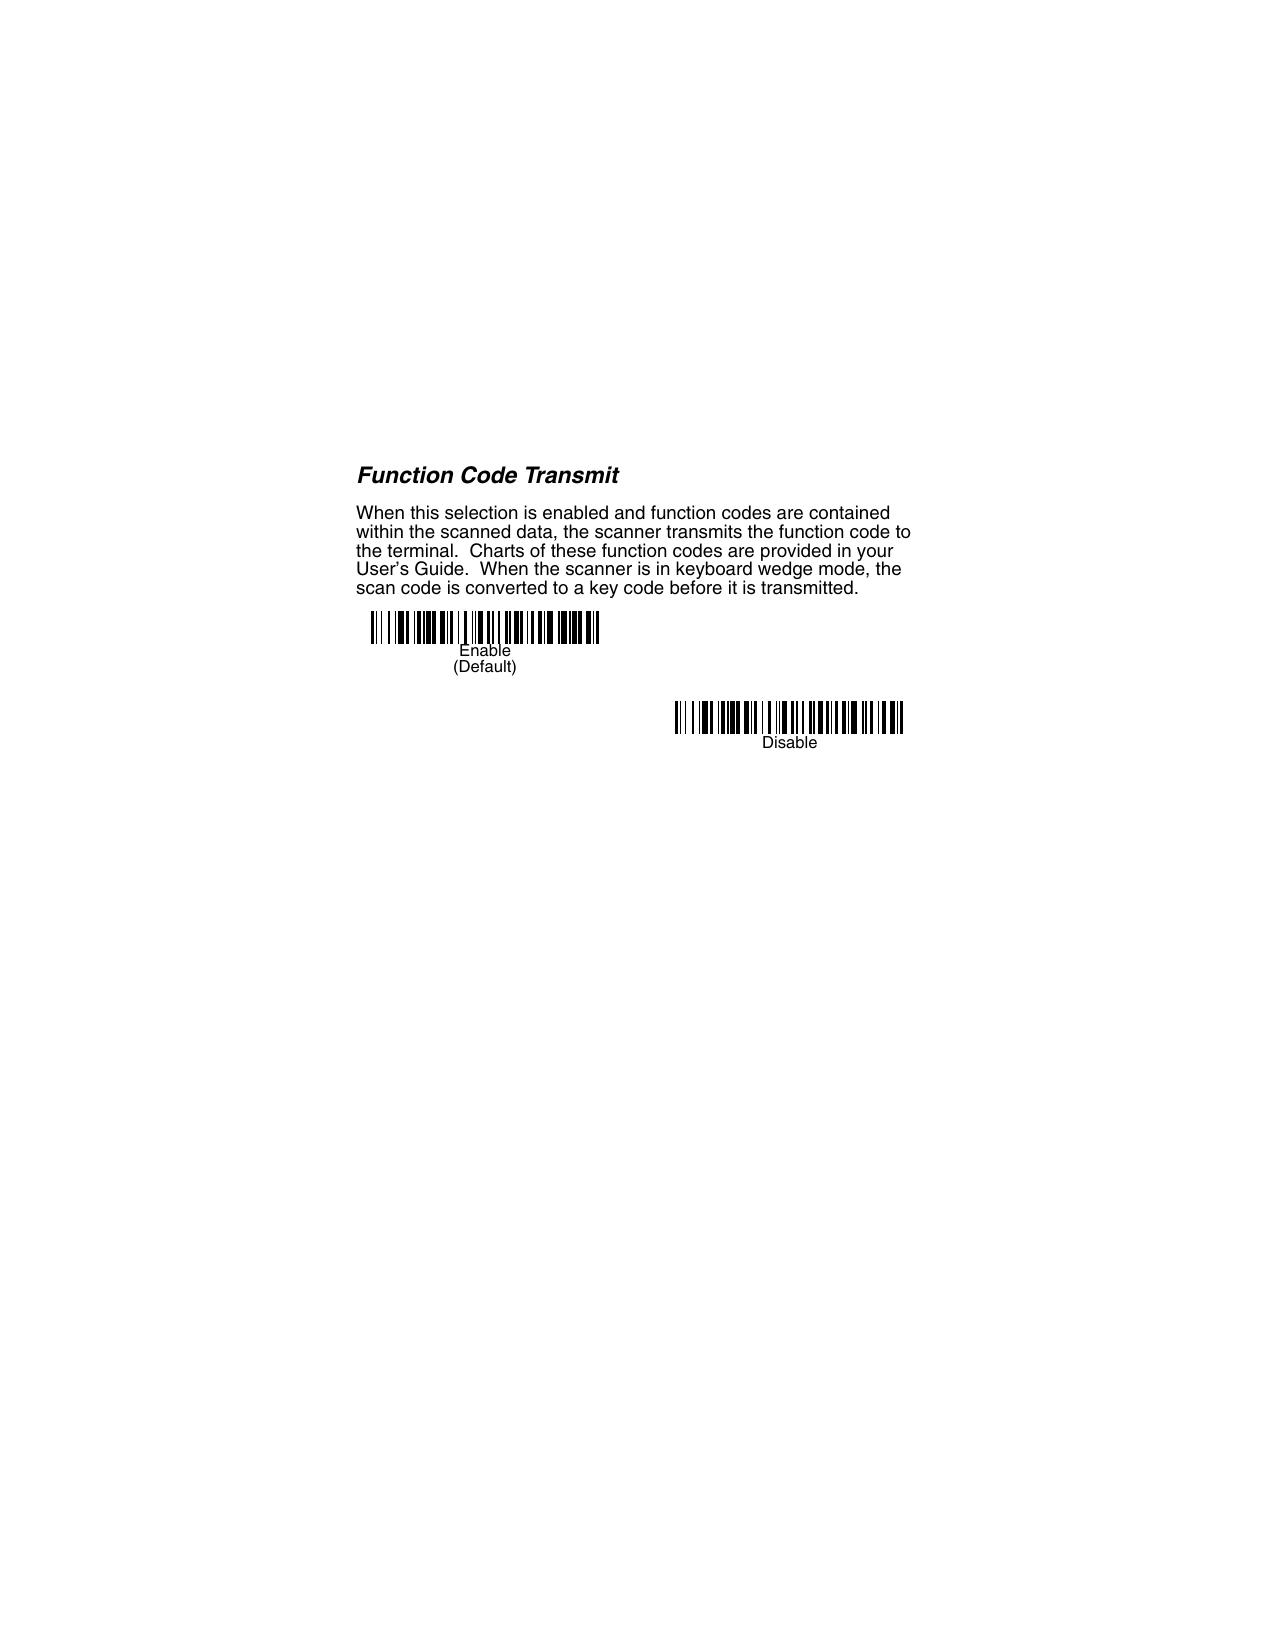 Honeywell 1911i Granit1911i Industrial Wireless Quick Start